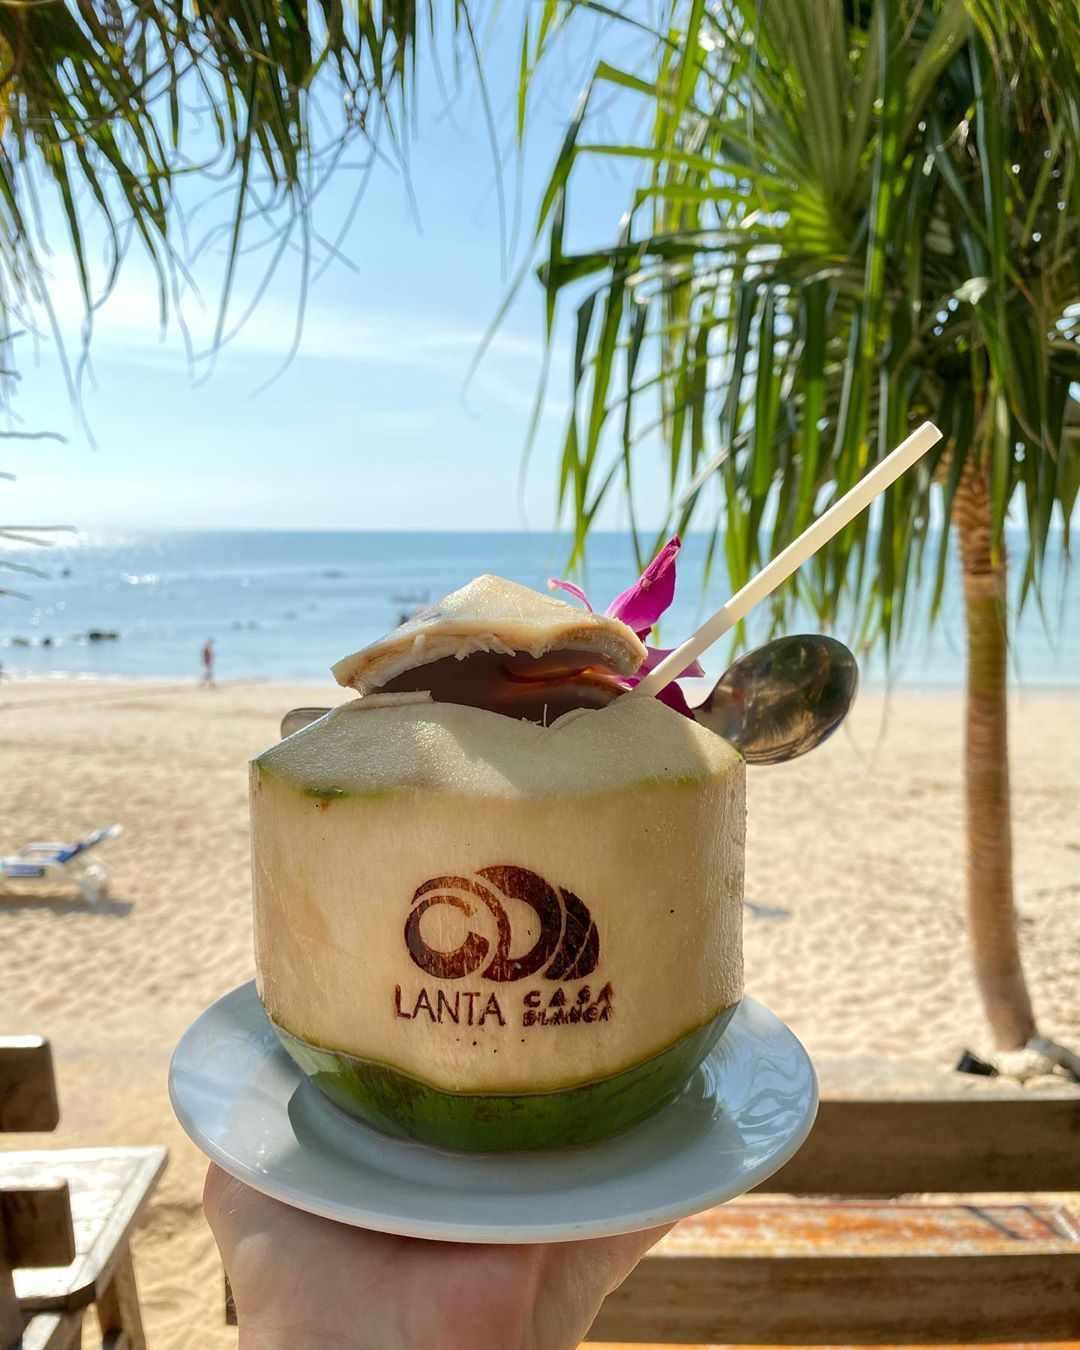 Coconut with Lanta Casa Blanca logo burned on it at Relax Bay Beach on Koh Lanta